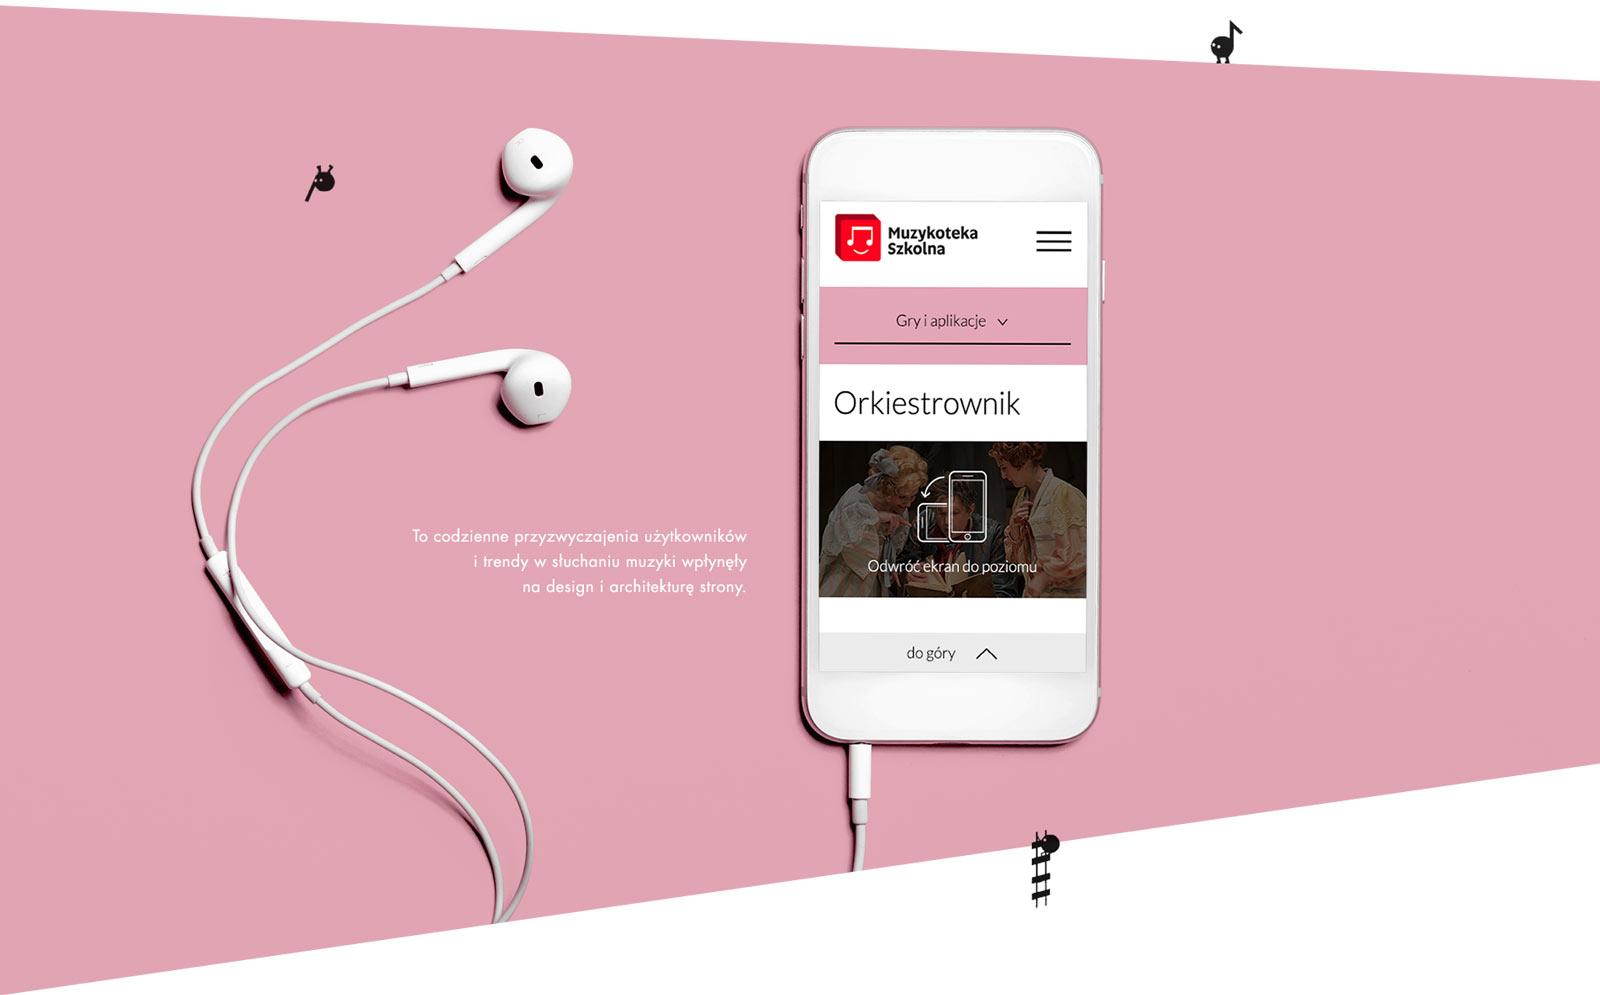 https://peppermint.pl/en/wp-content/uploads/sites/2/2018/09/iphone-1.jpg